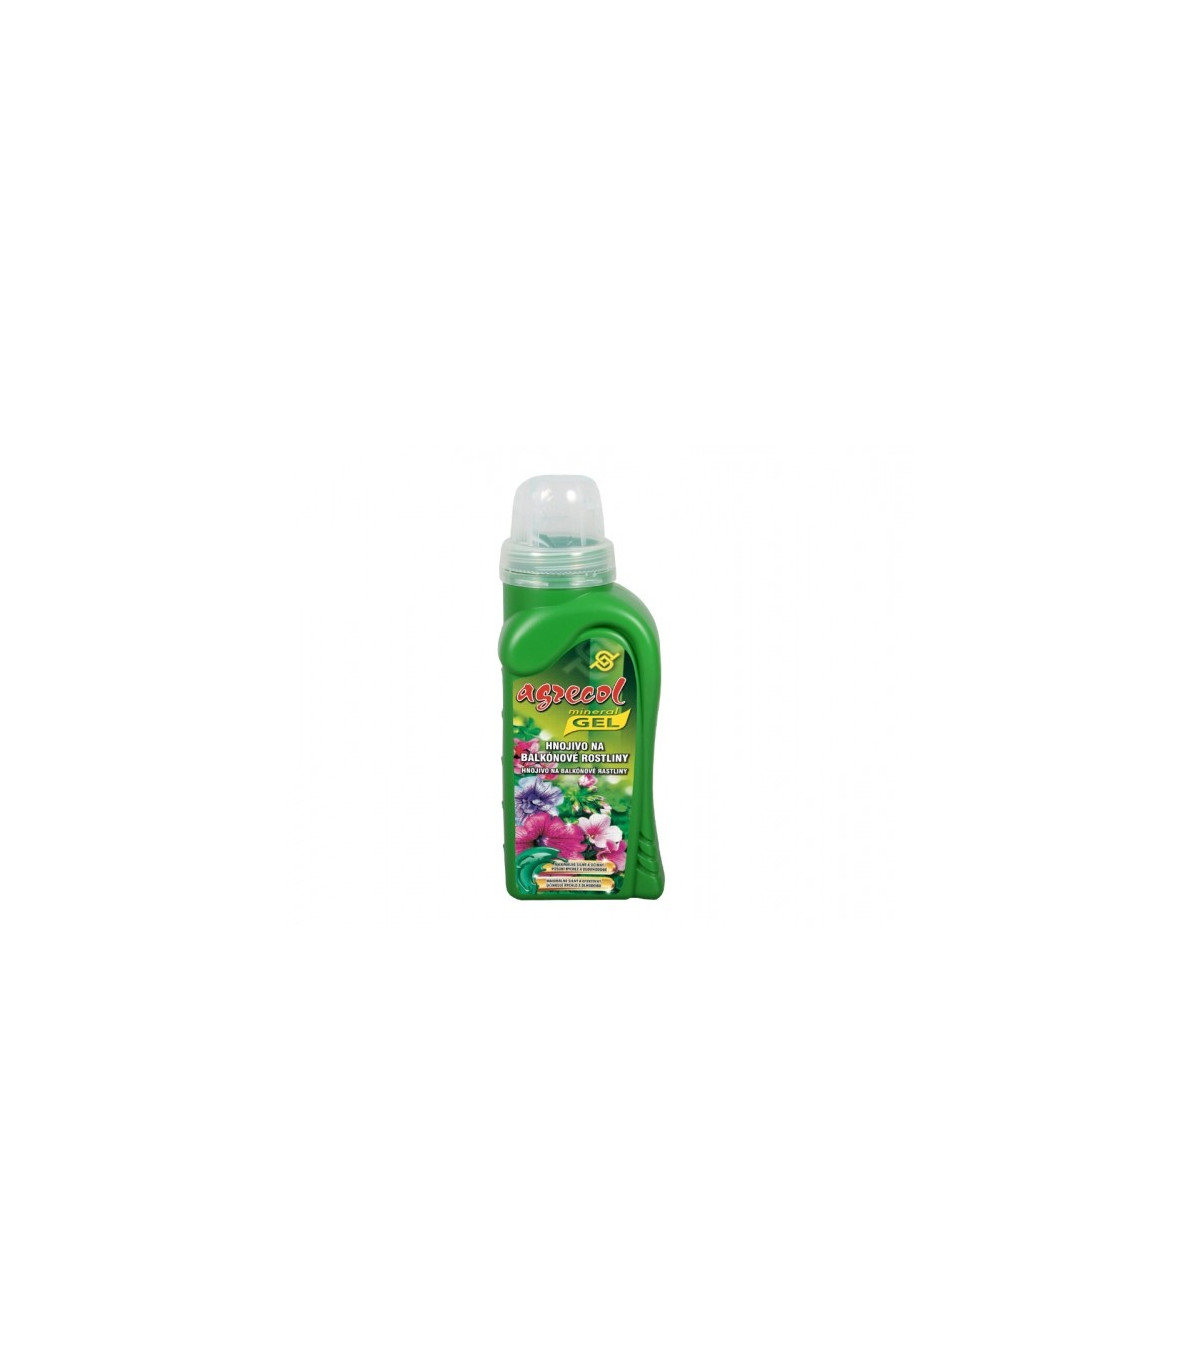 Agrecol hnojivo na balkónové rostliny -  500 ml